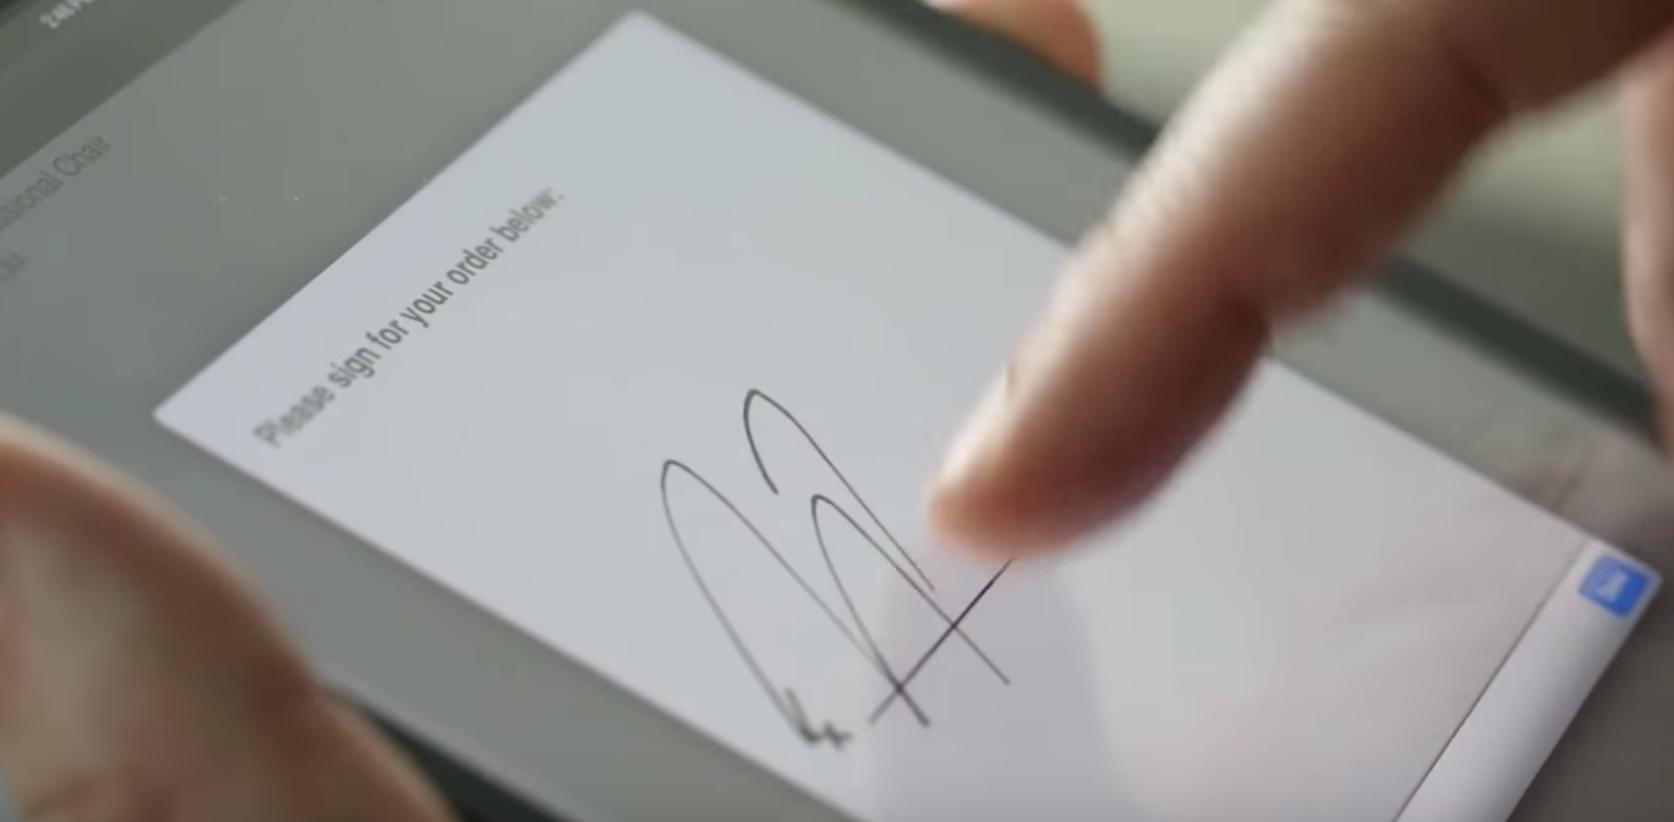 RepZio Software - Capture signatures electronically